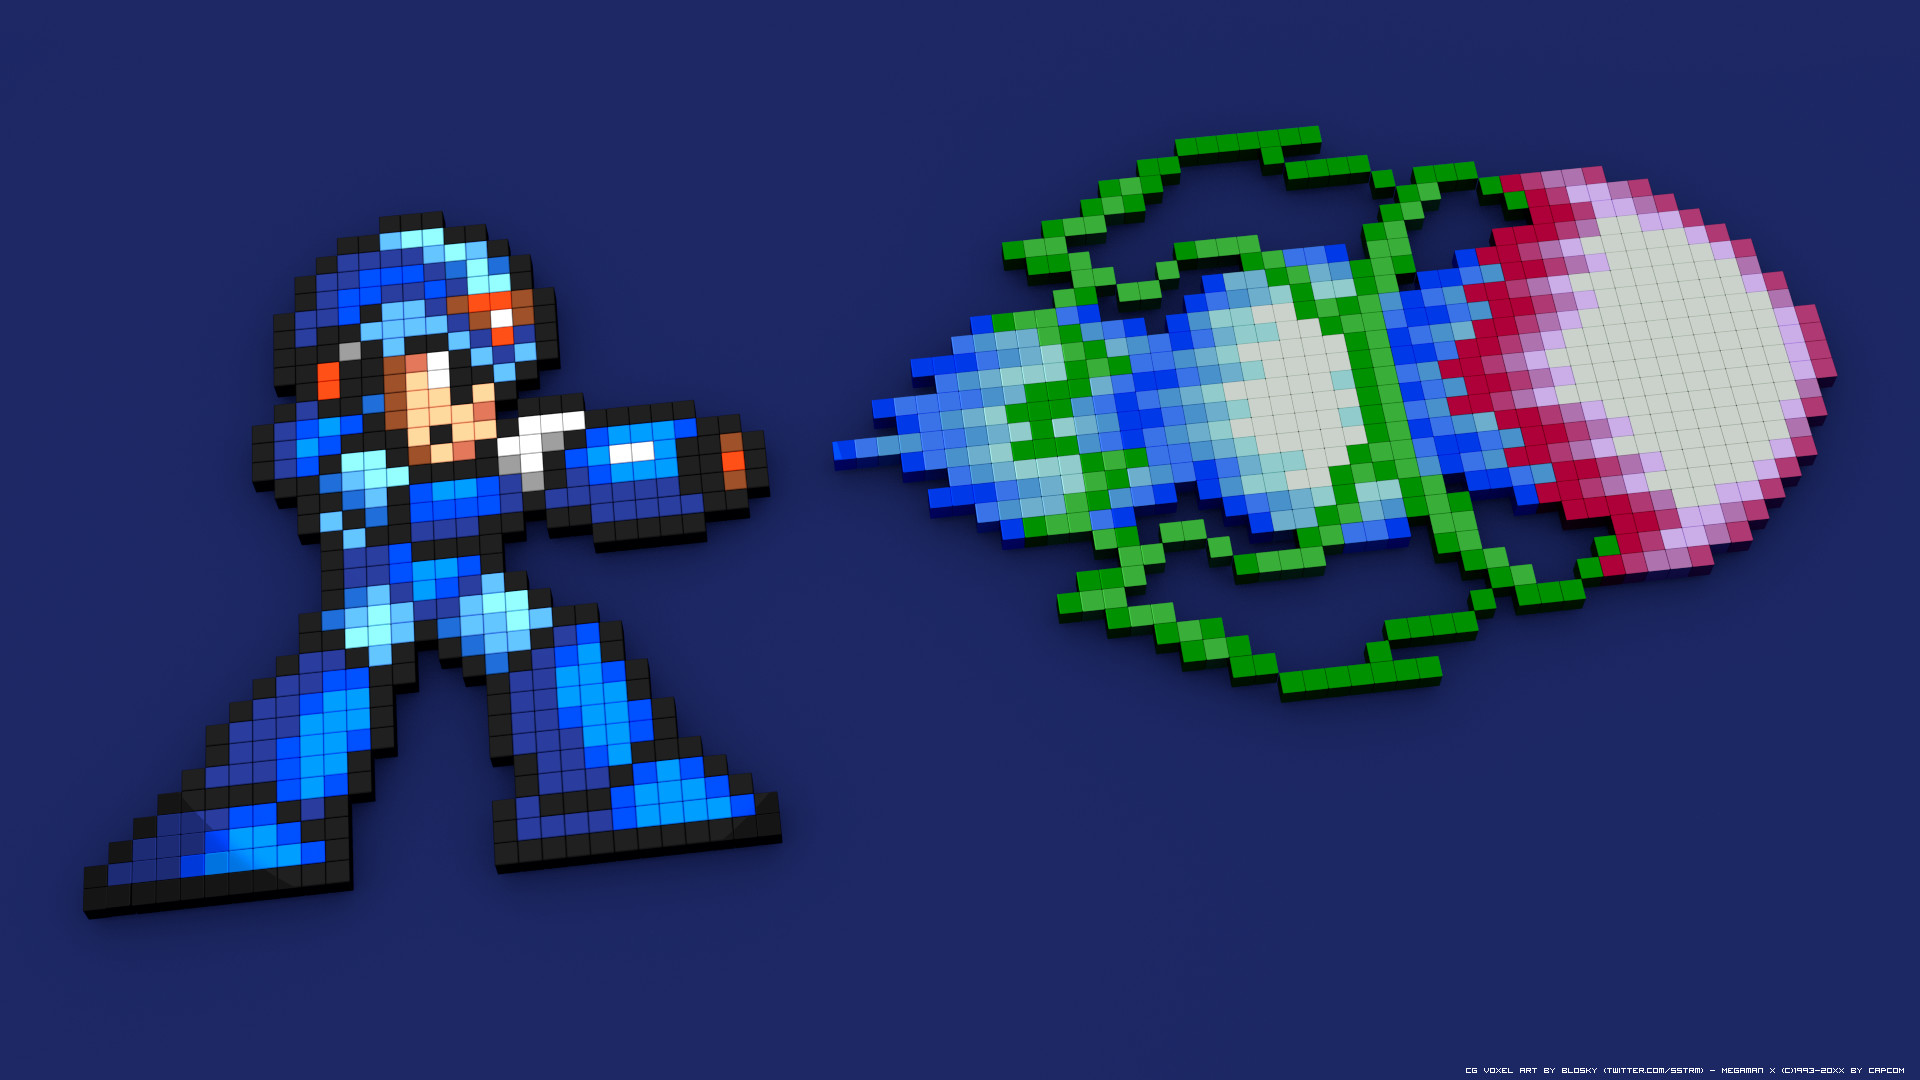 General Megaman X 16-bit 8-bit pixelated pixel art 3D Blocks 3D